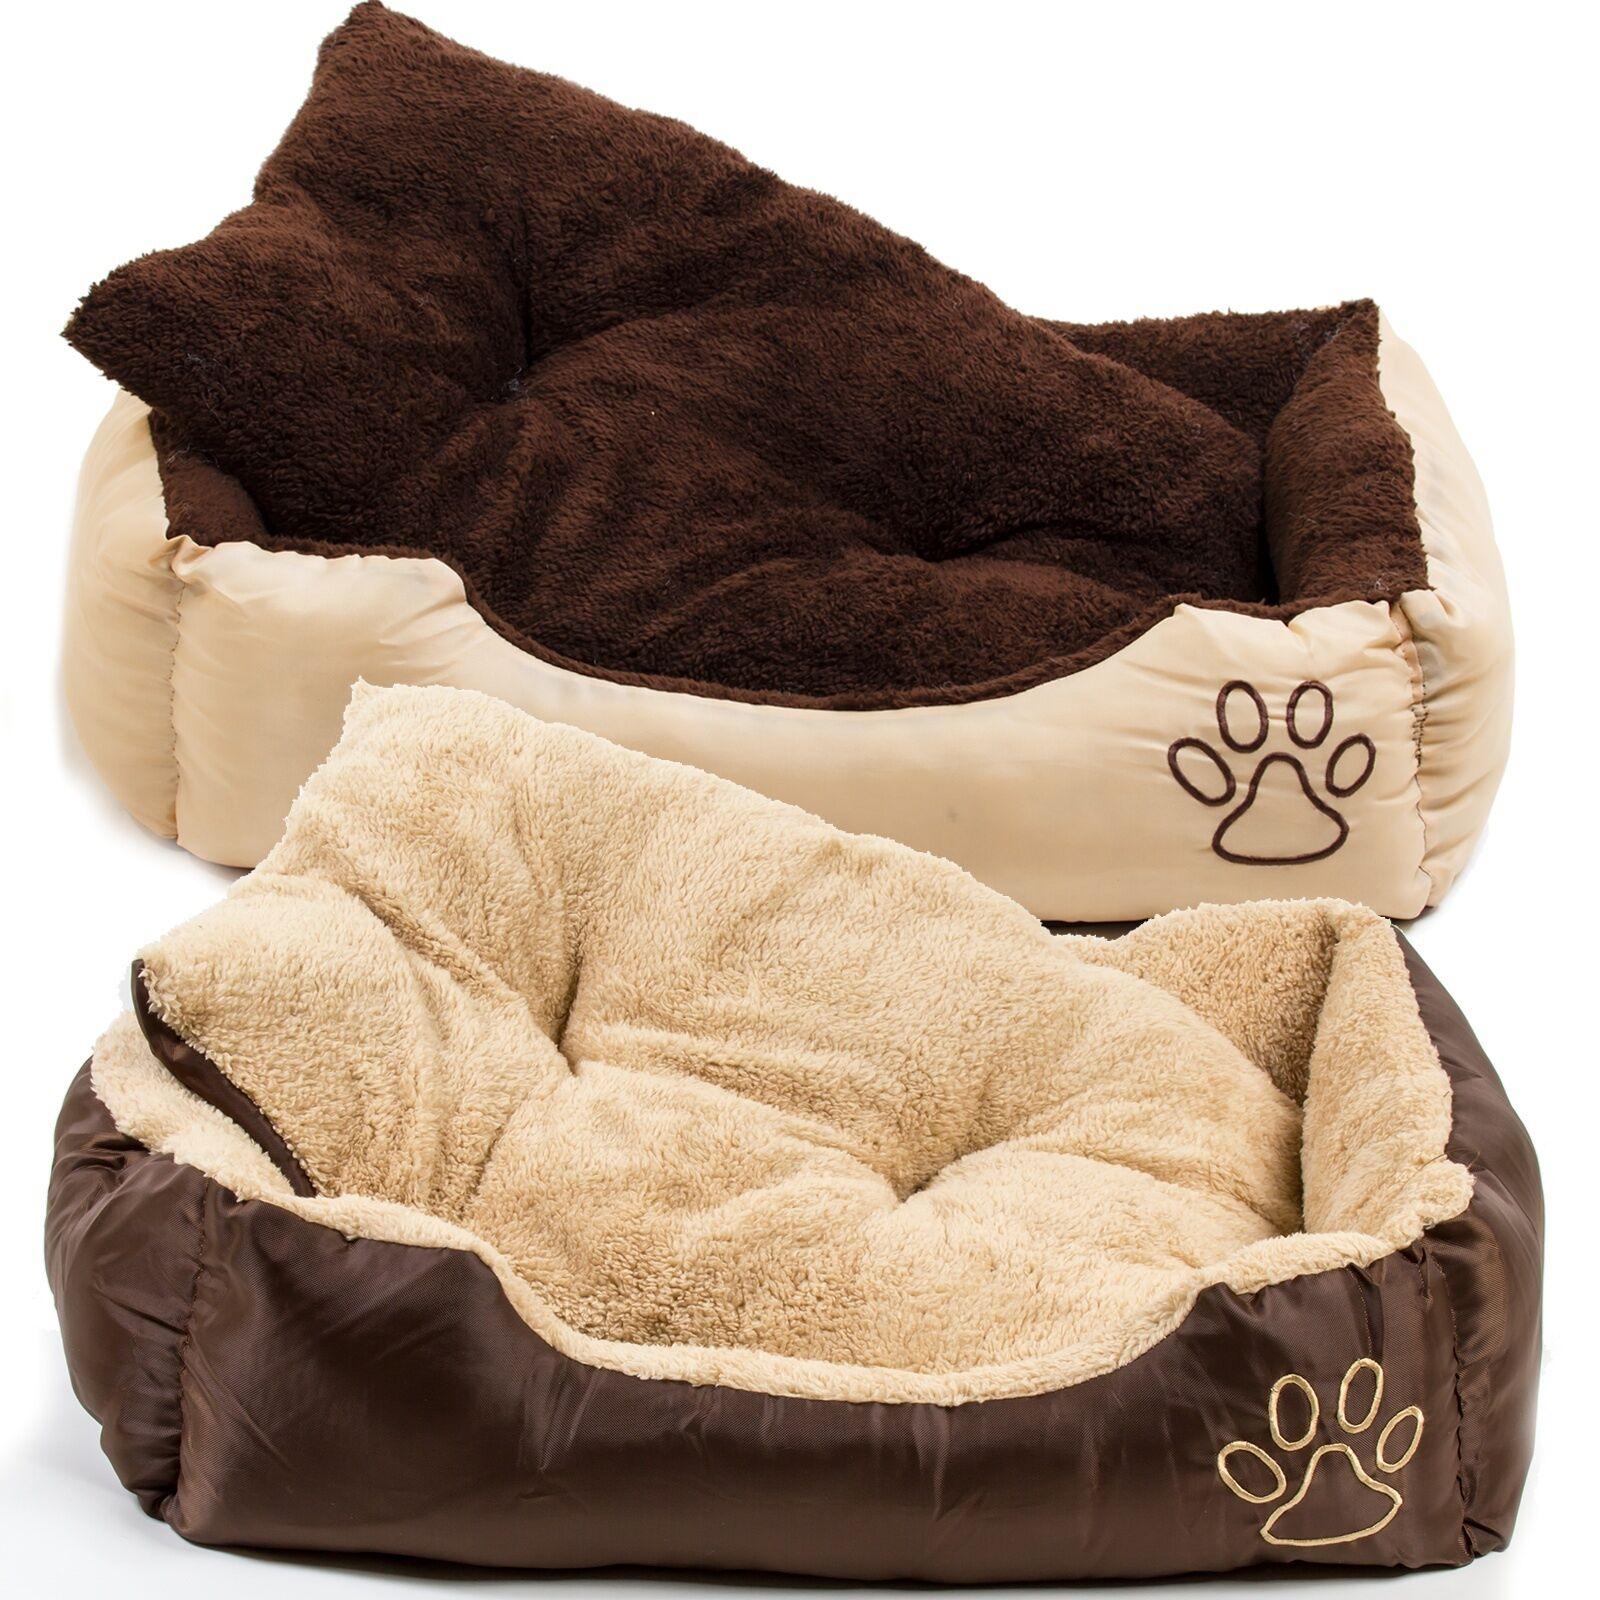 hundebett mit kissen hunde korb hundesofa k rbchen katzen. Black Bedroom Furniture Sets. Home Design Ideas